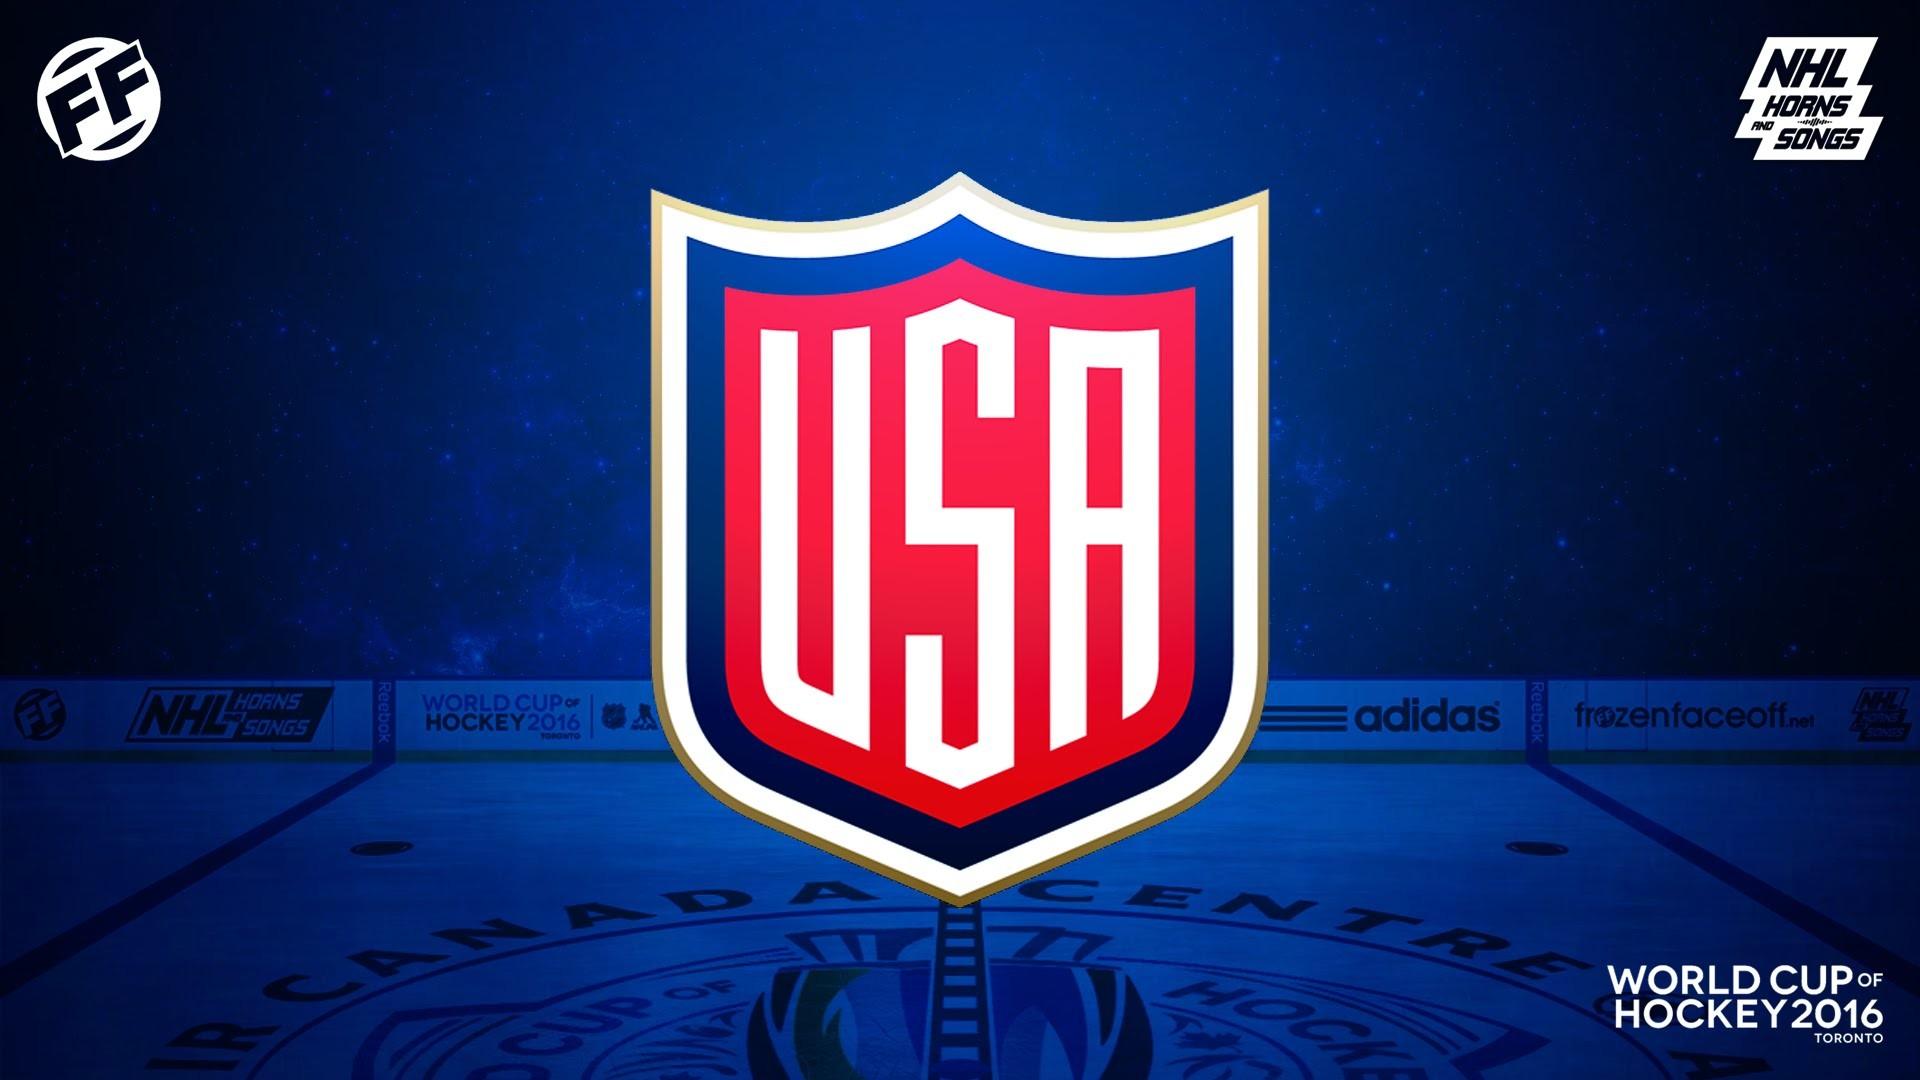 1920x1200 Field Hockey Wallpapers HD Download 1920A 1200 44